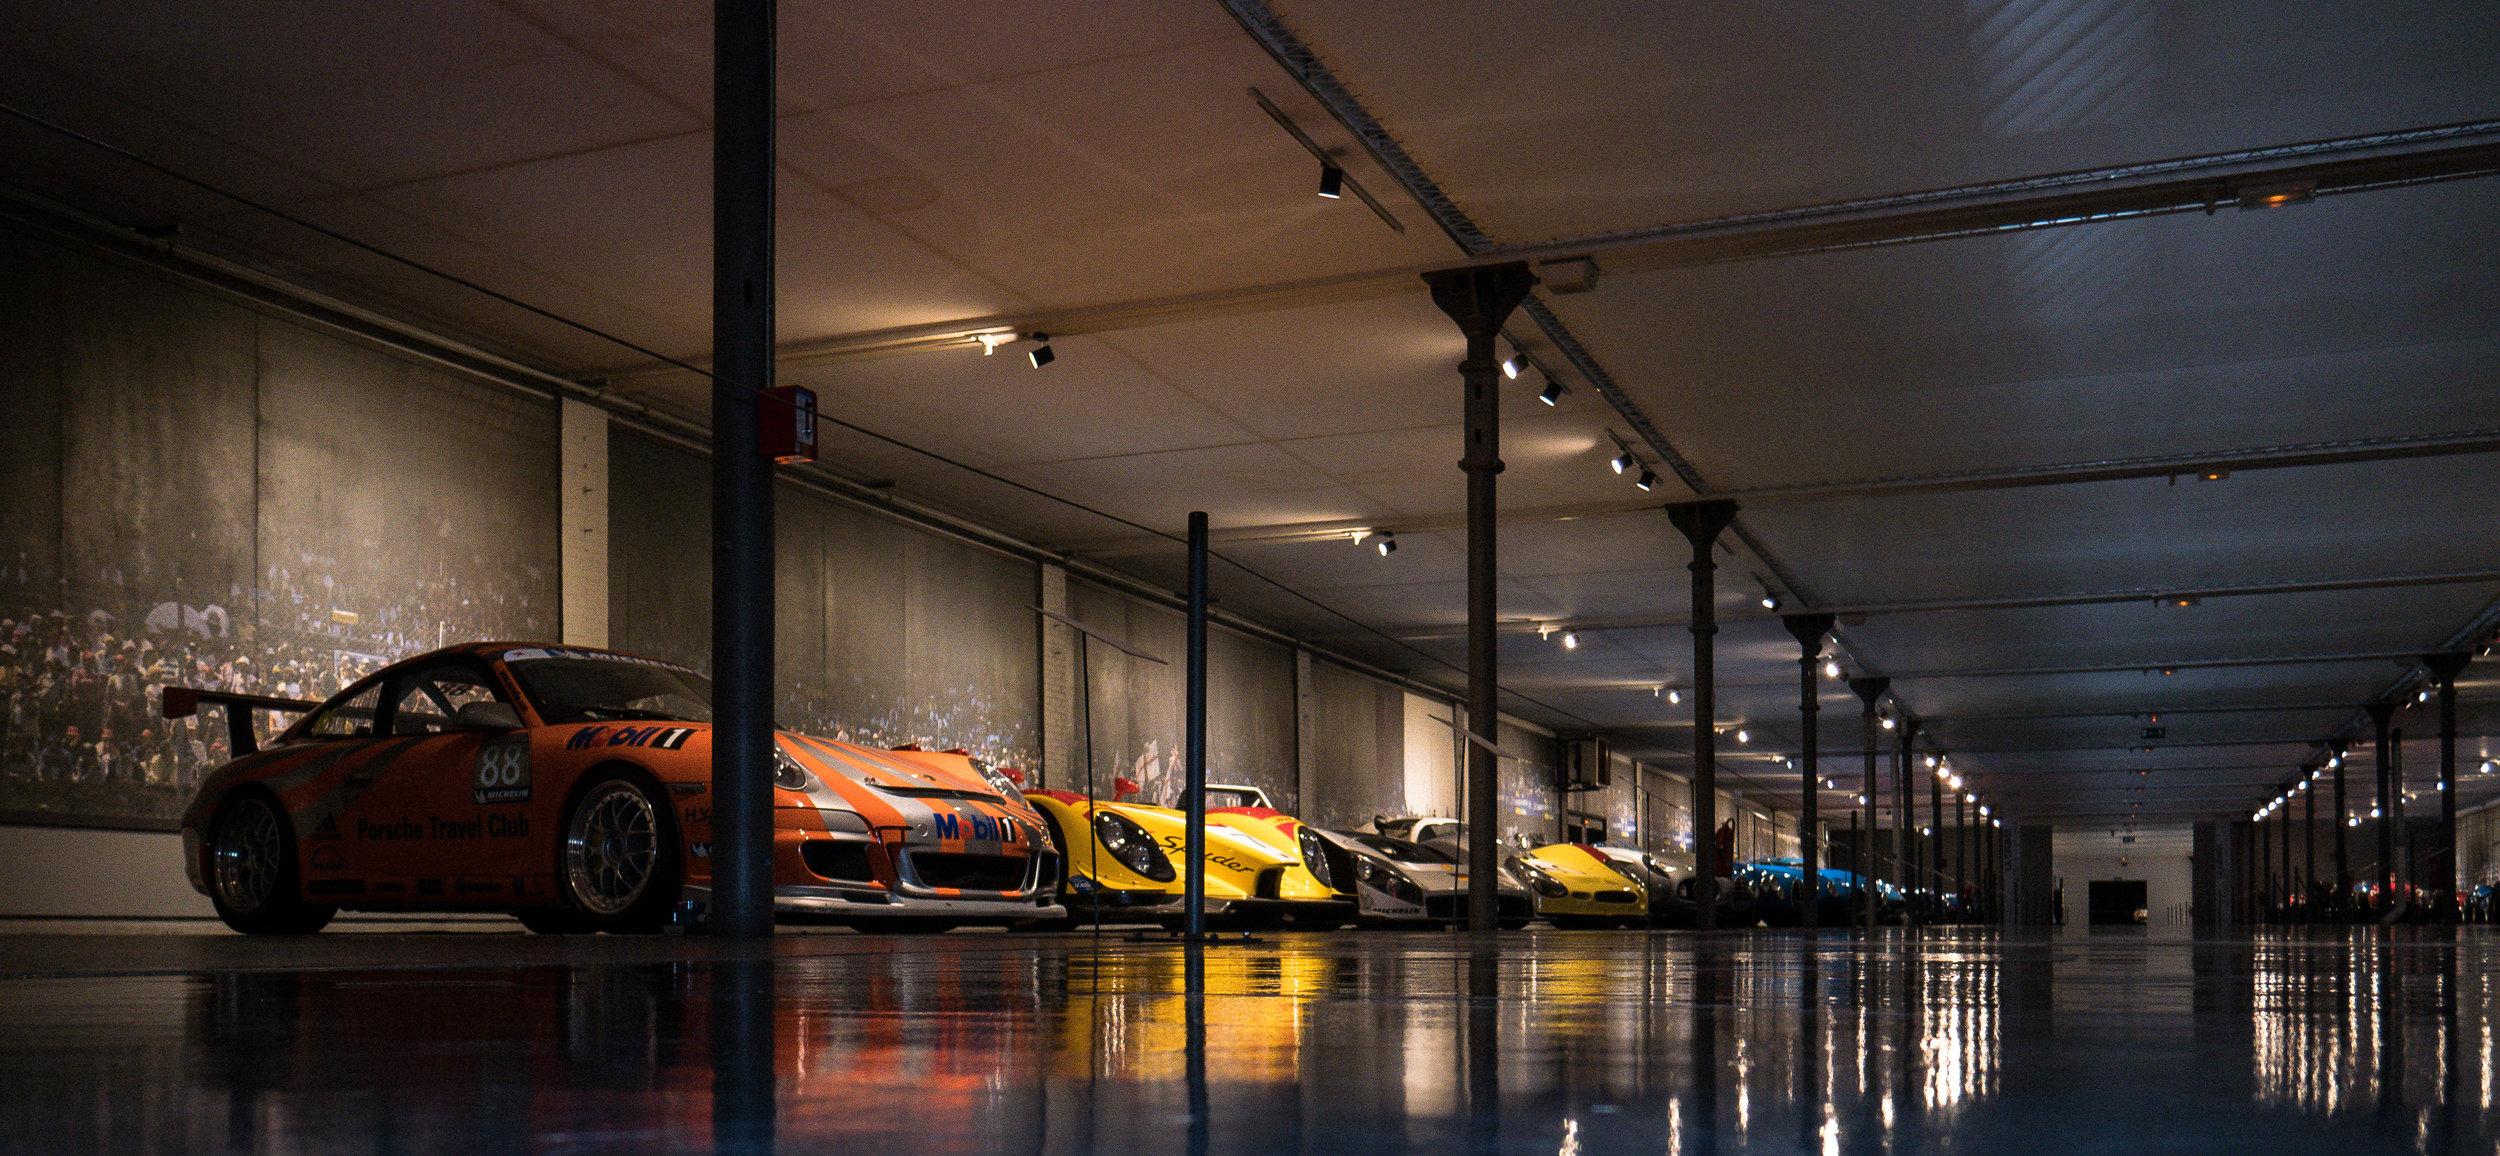 Multiple modern race cars displayed in a long, low ceiling room (Credit: Nicolai Rauser)